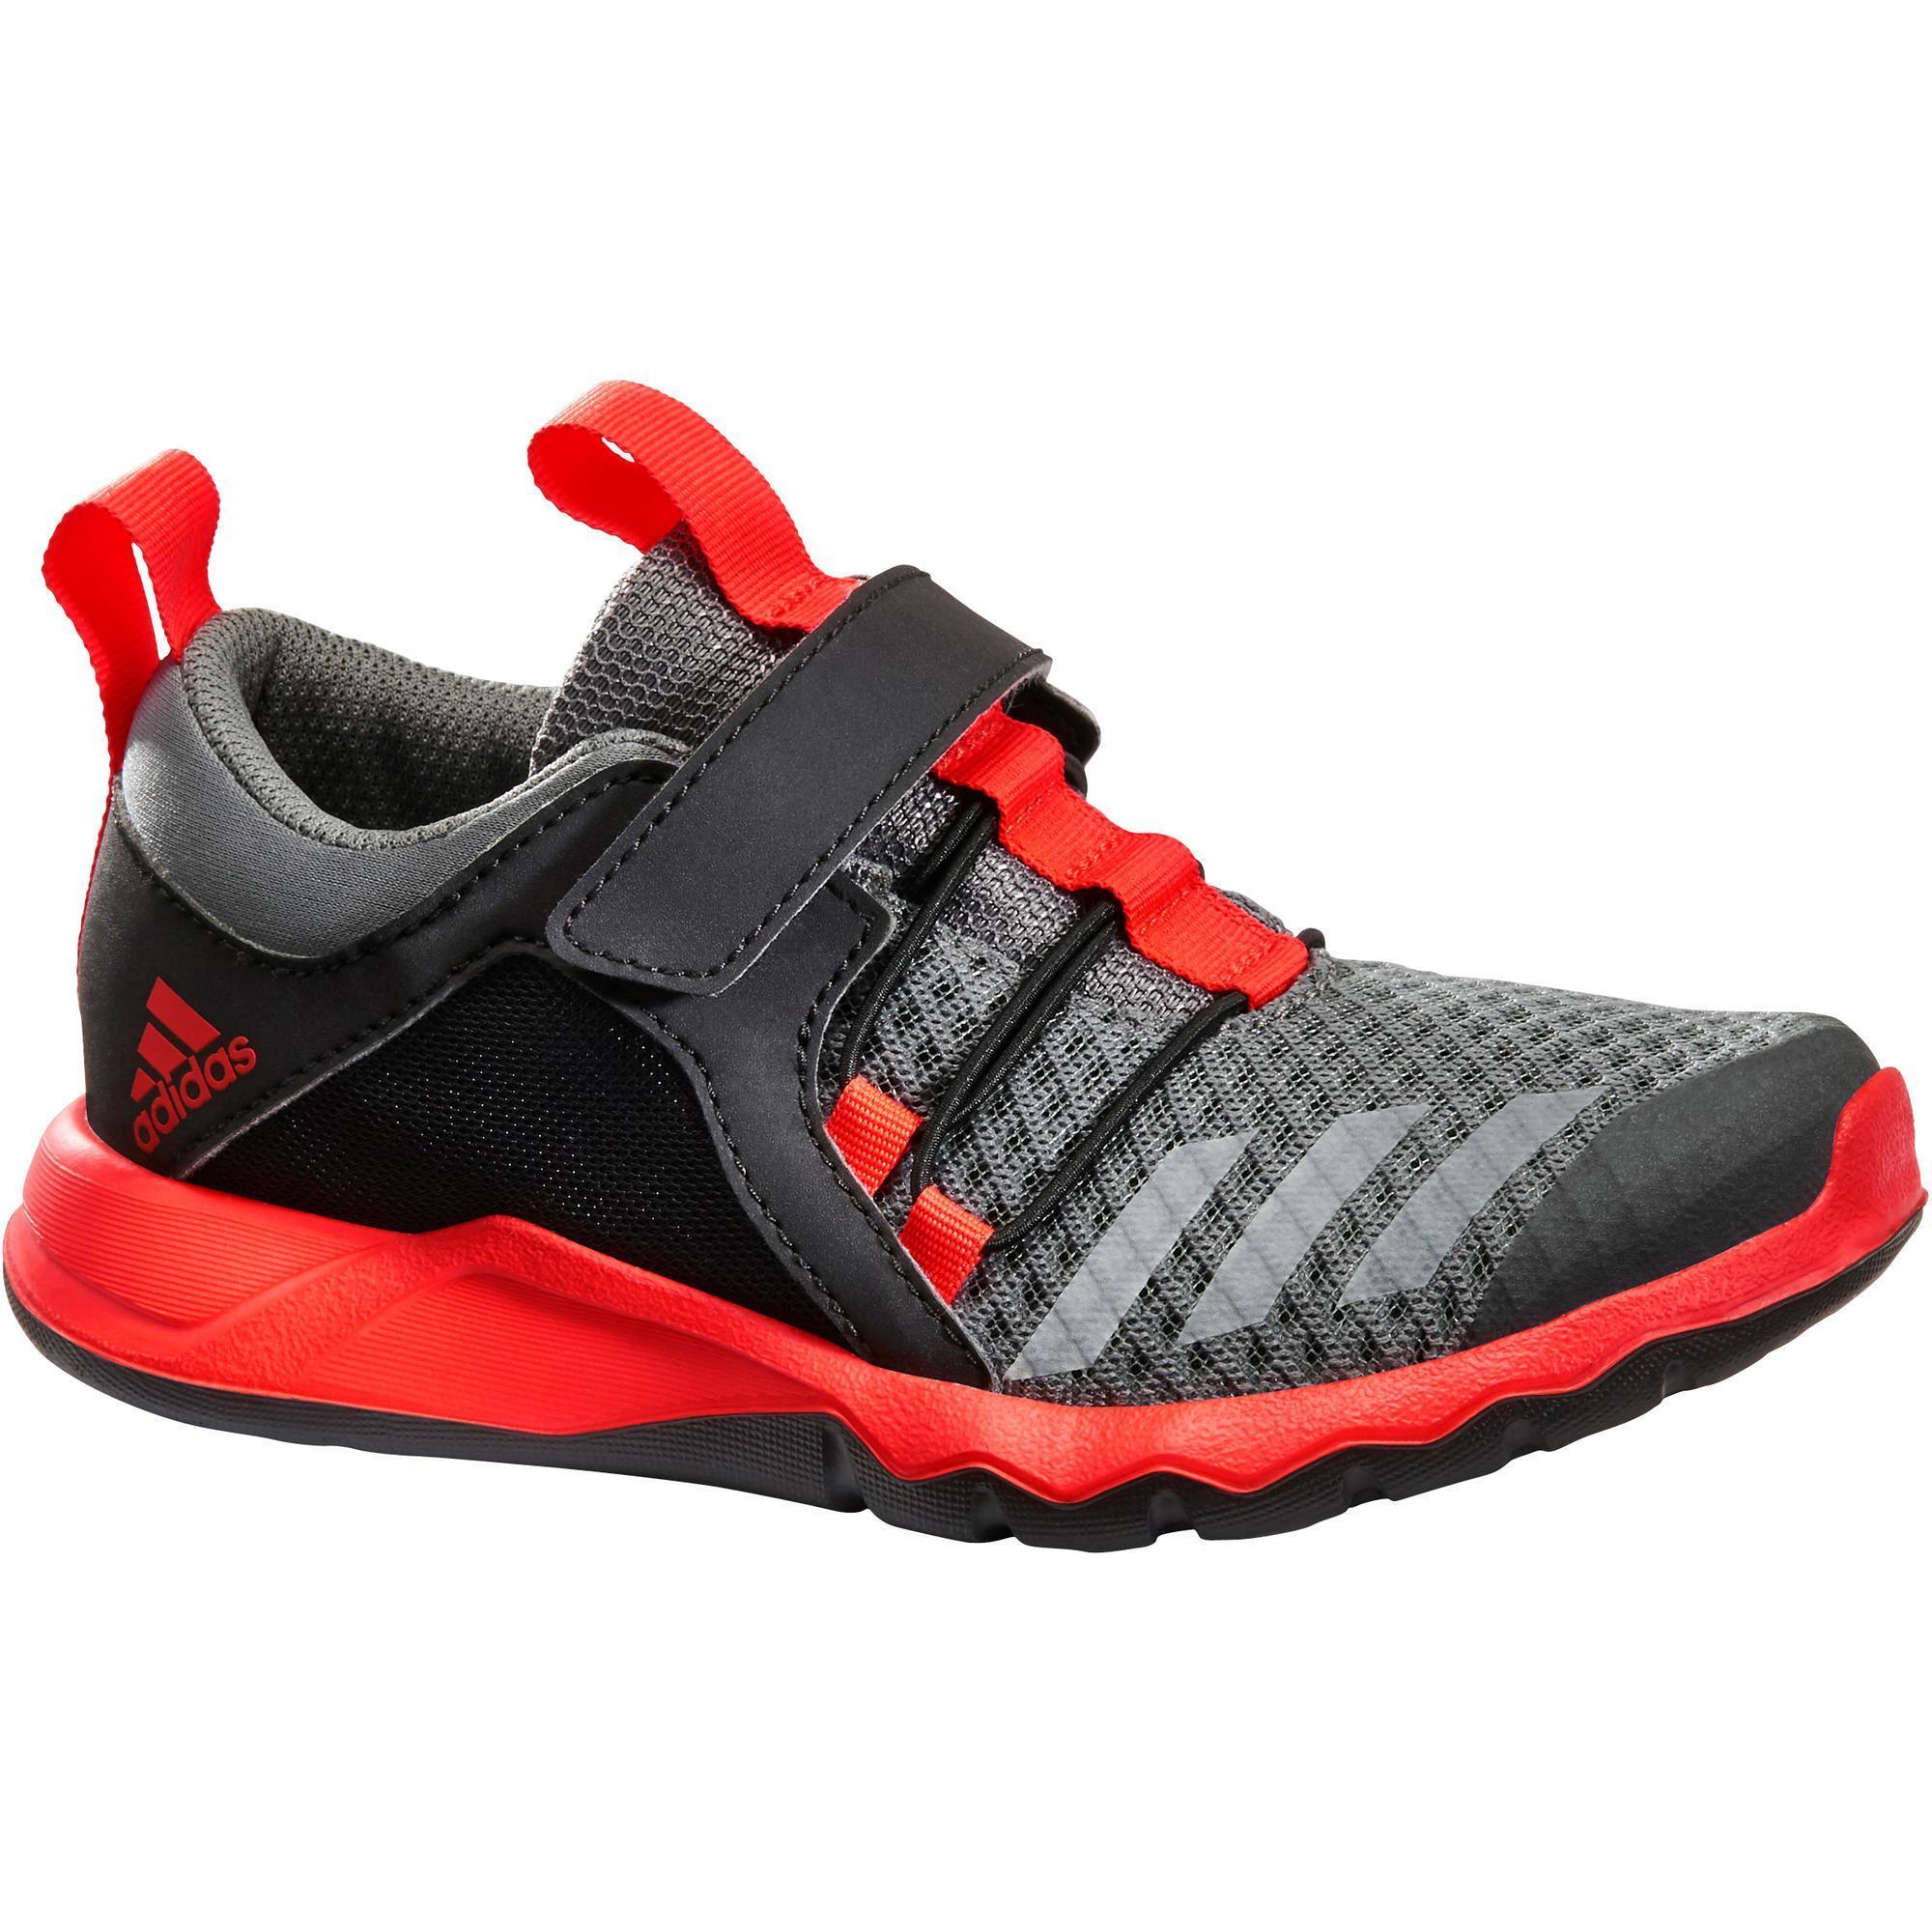 Adidas Kindersneakers Rapida Flex2 zwart-rood